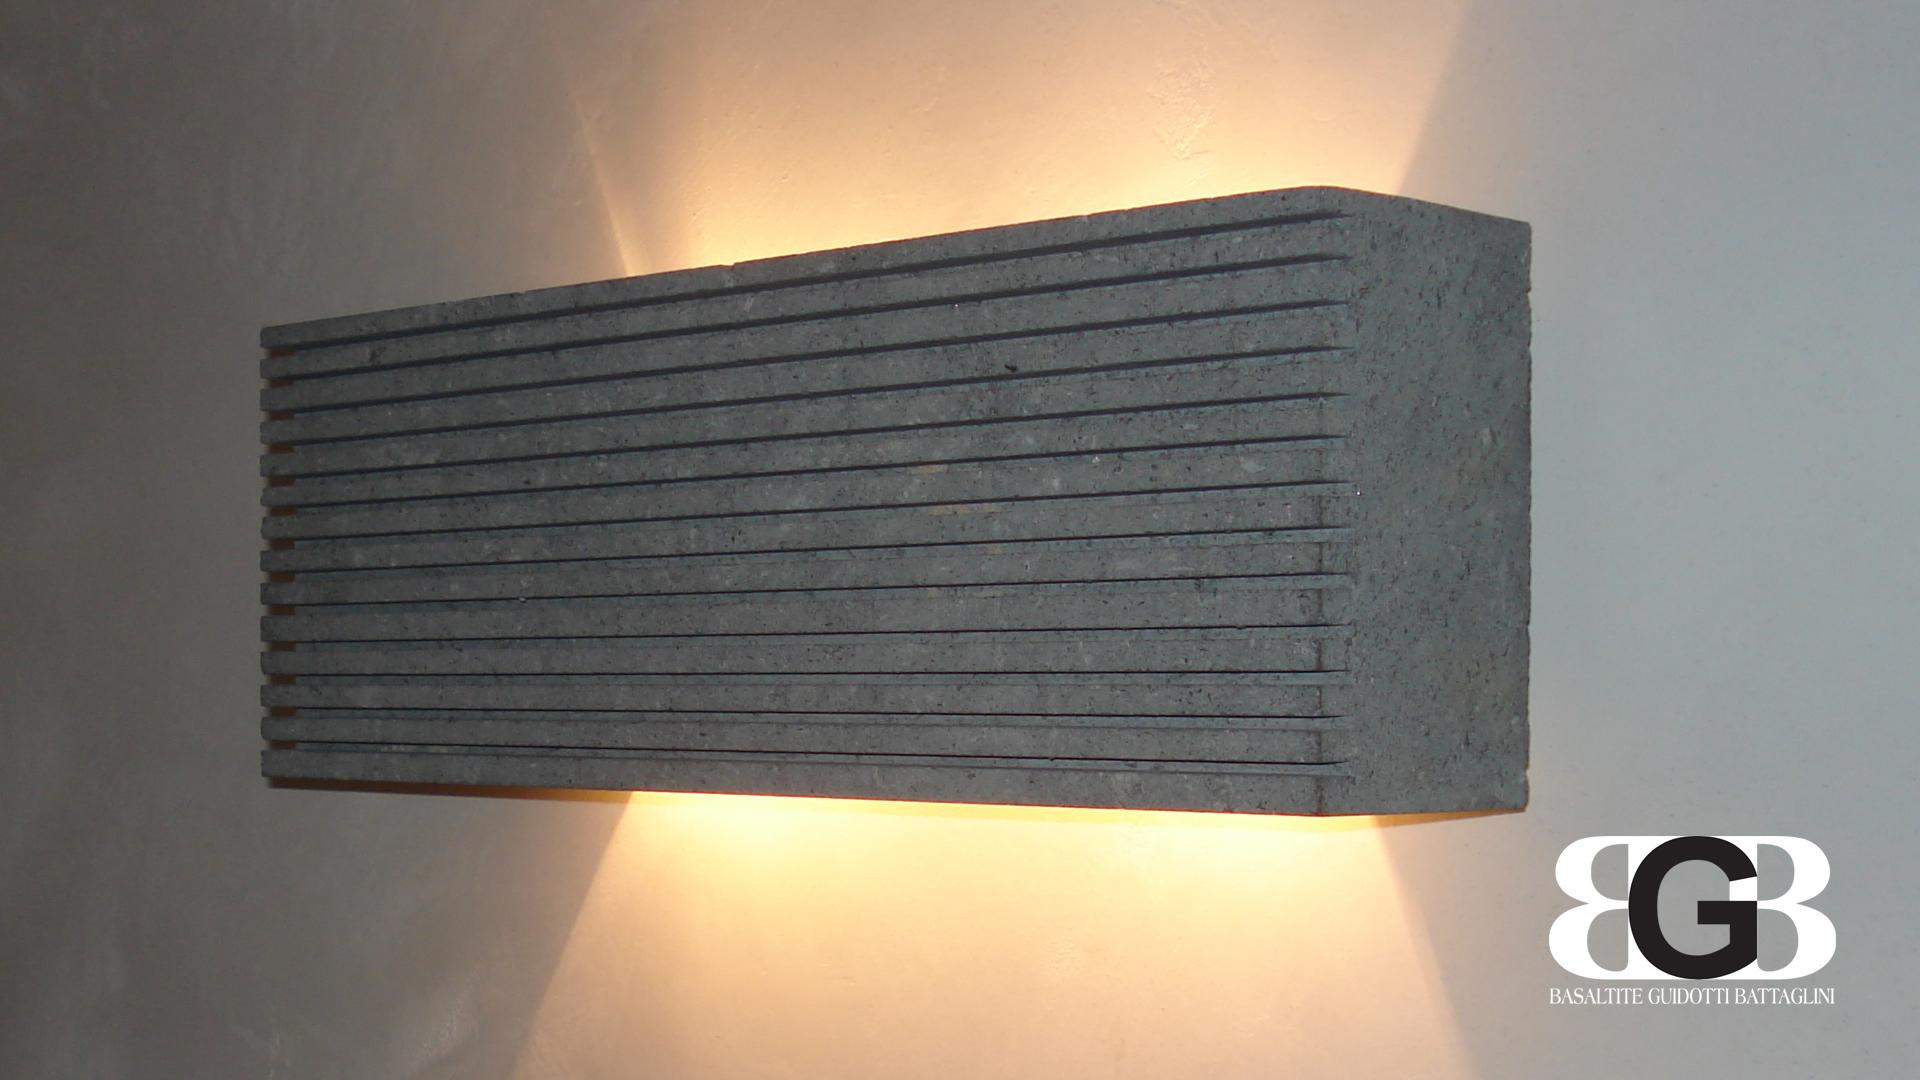 basaltite-artistic-realization